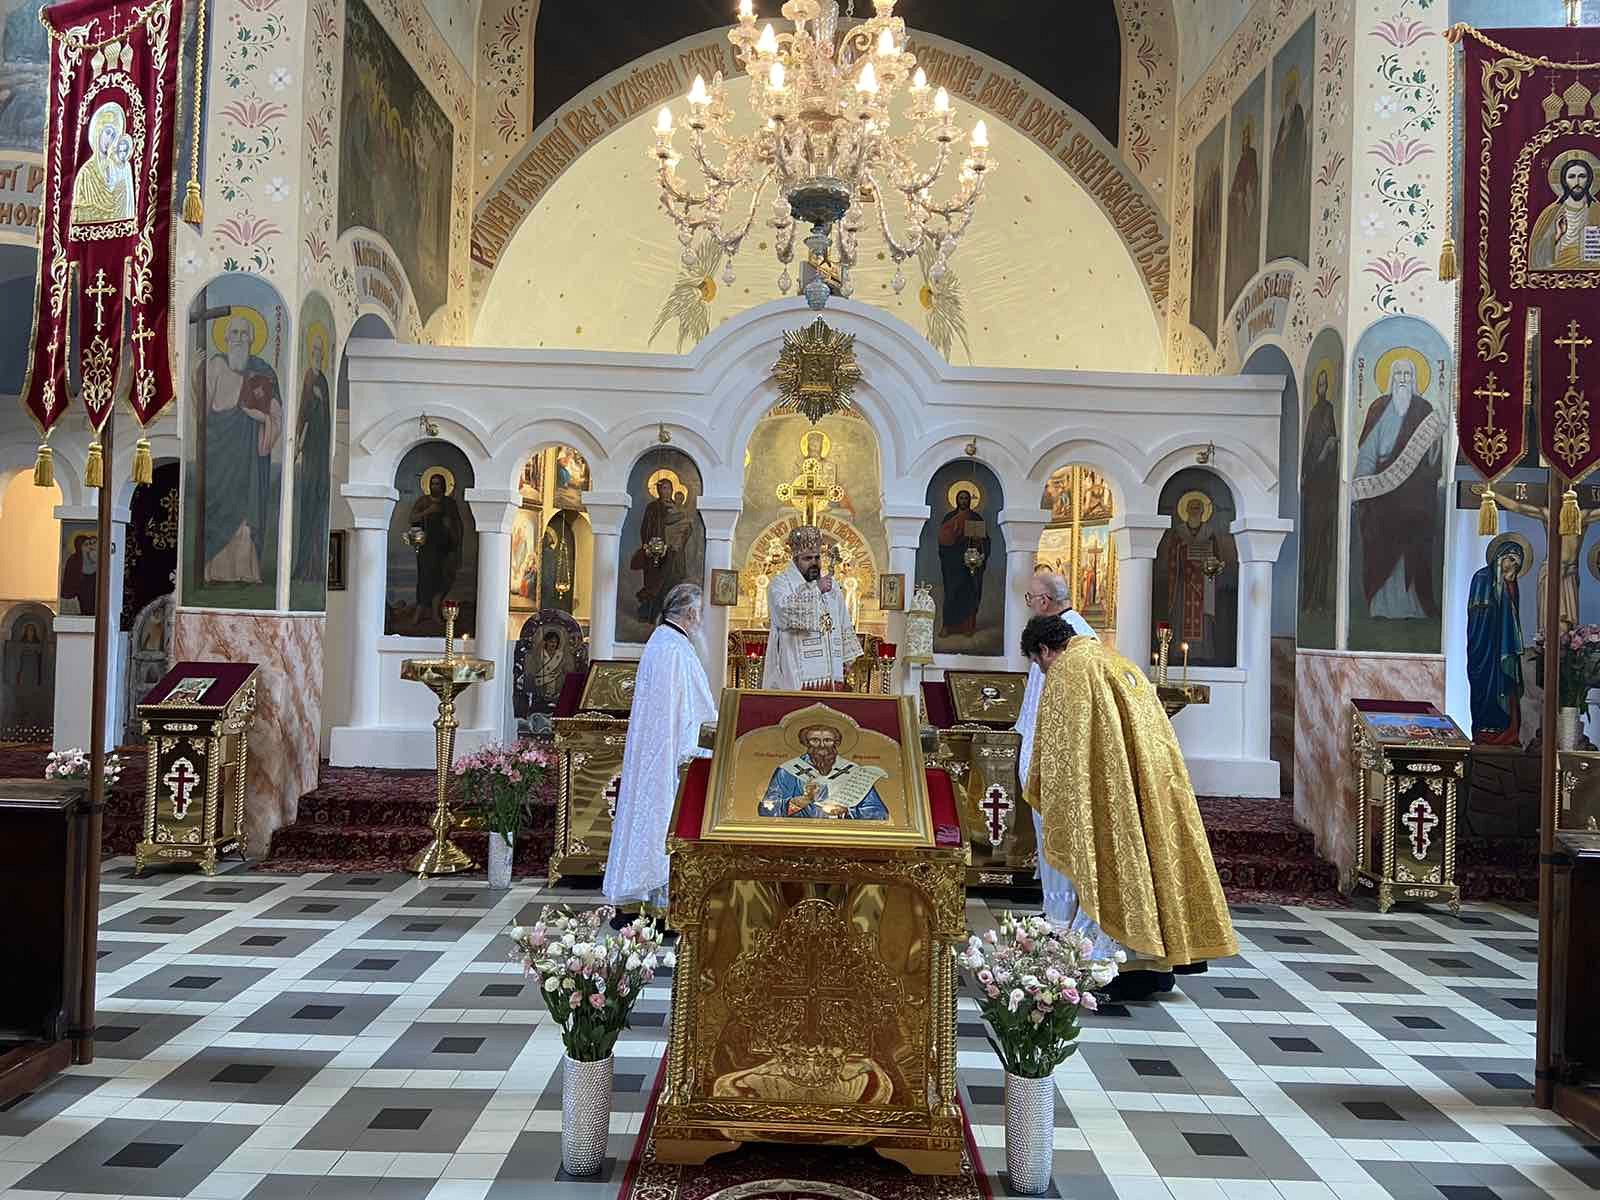 2021-06-01-presbyterium-liturgie-71-F14C29E8-F607-4F16-A746-9BA69A0CD695_1